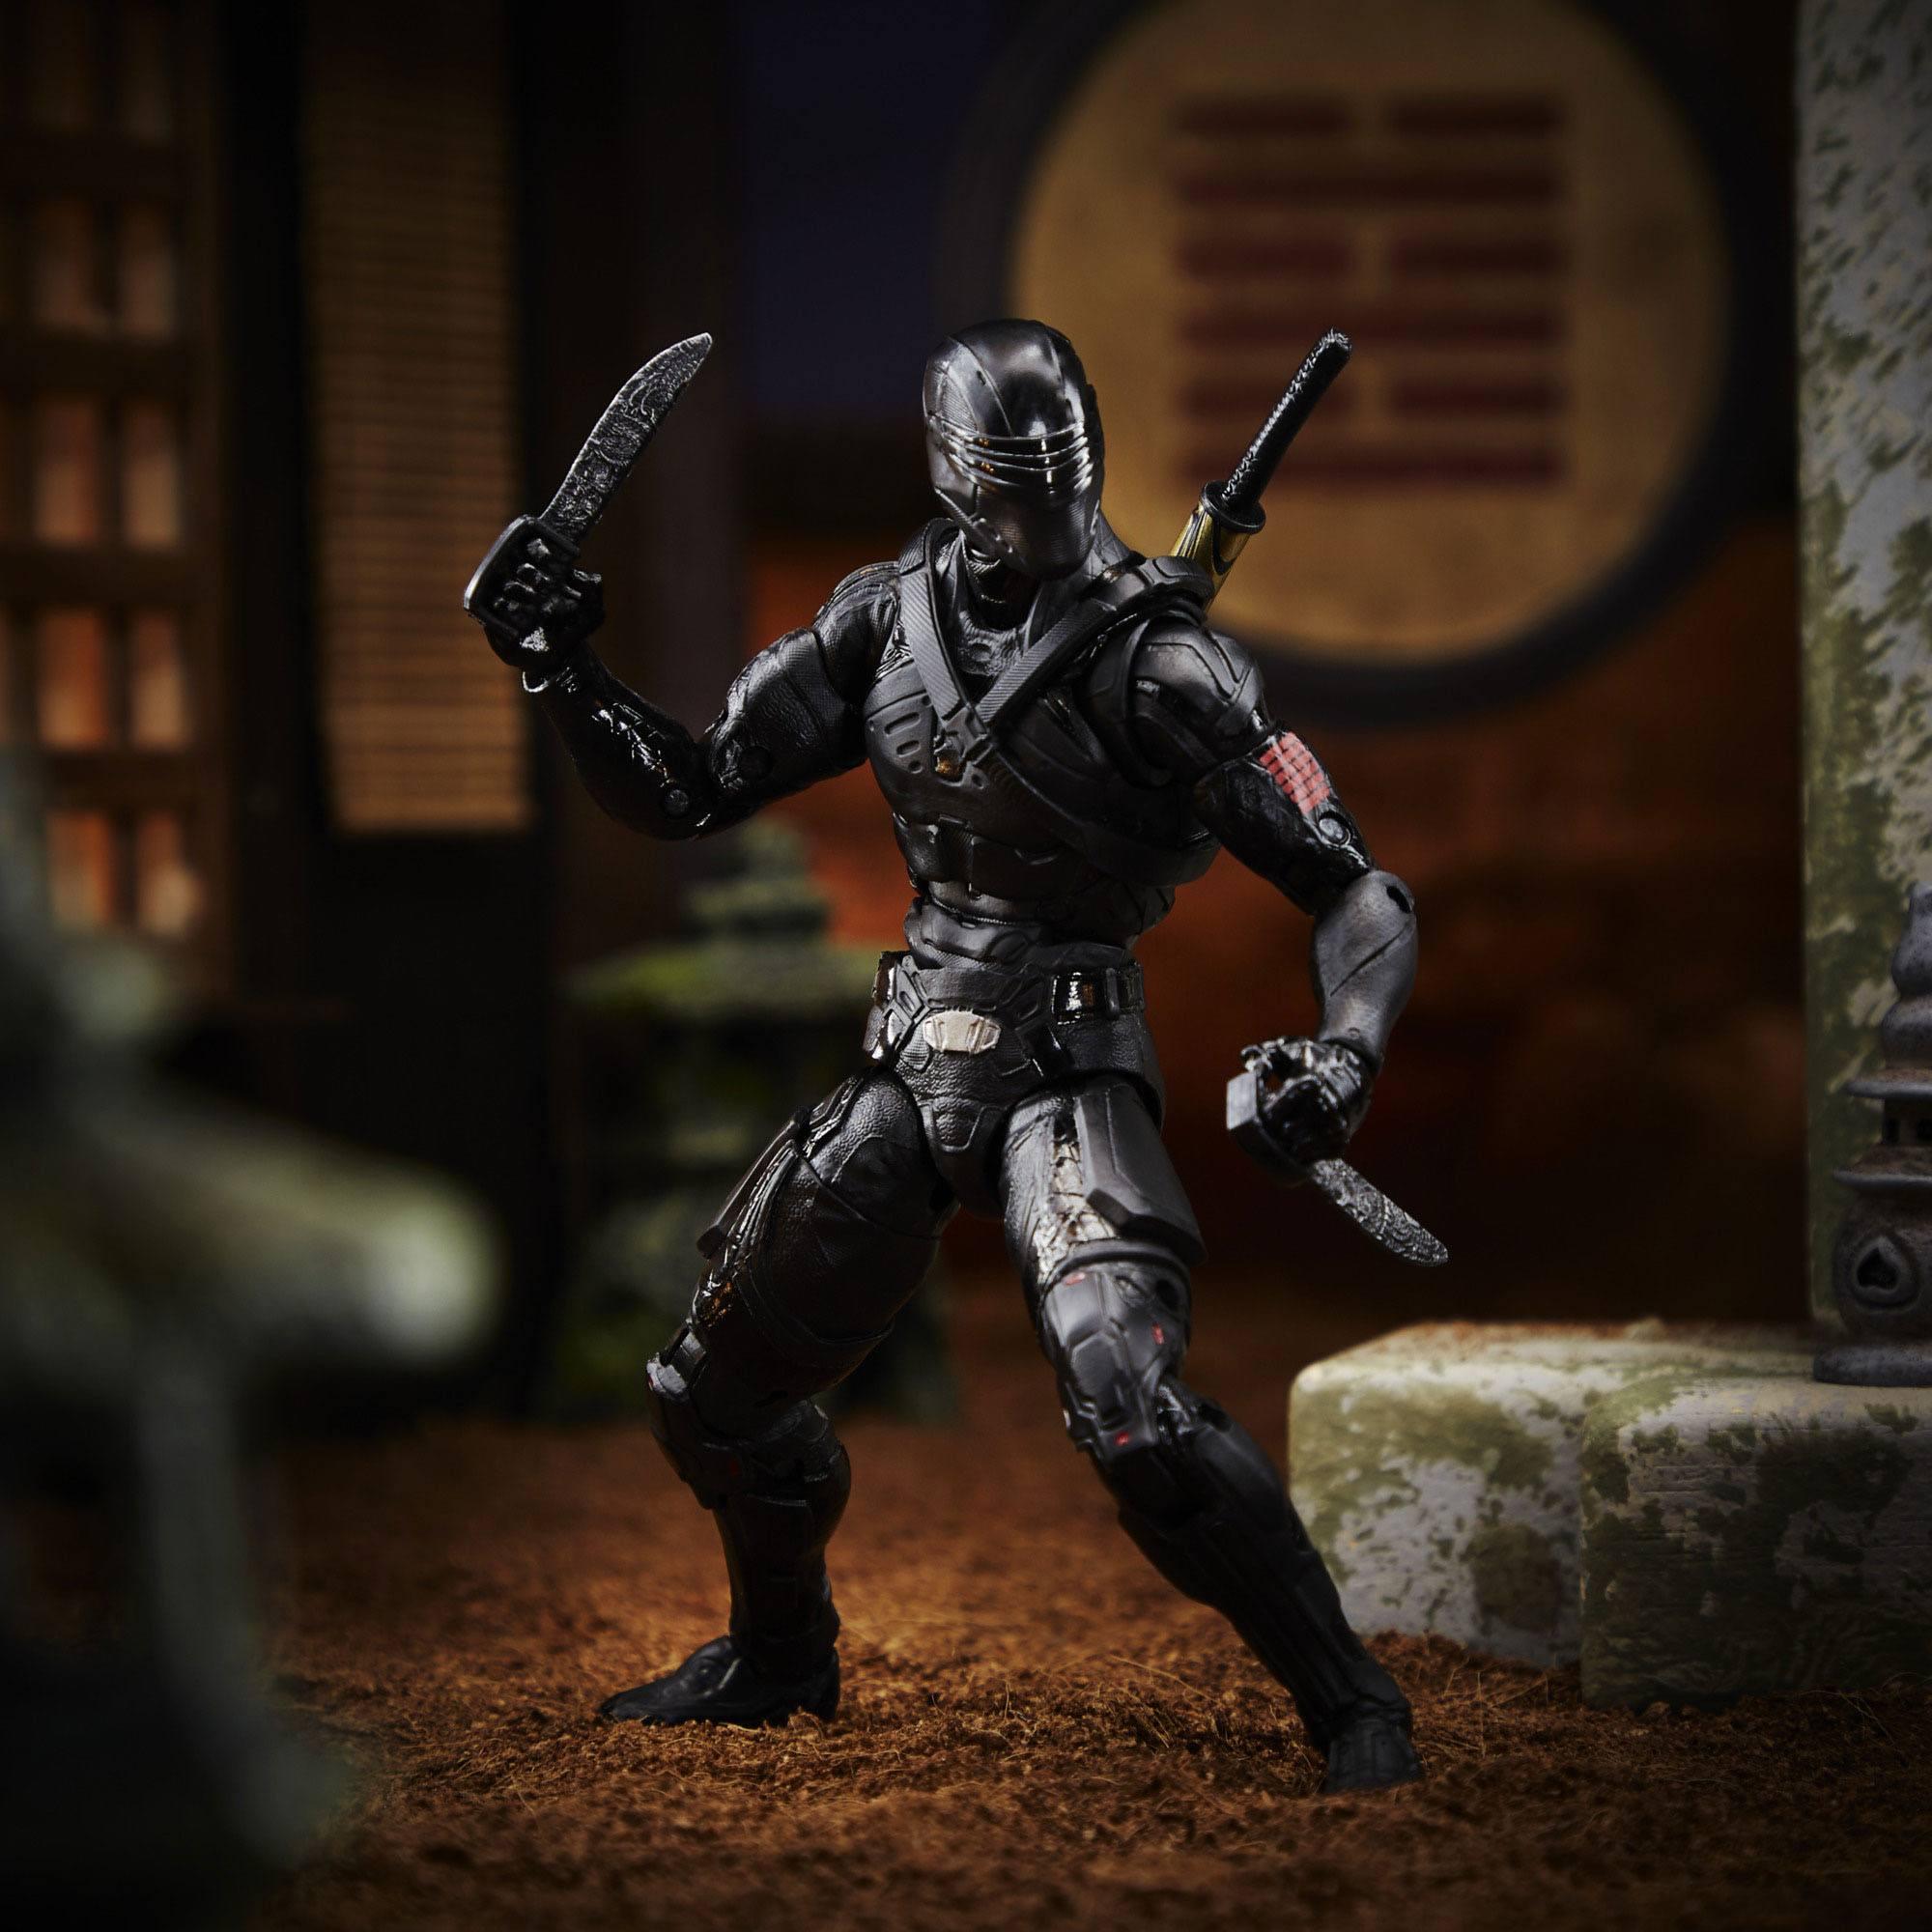 G.I. Joe Classified Series Actionfigur 15 cm Snake Eyes (Movie) E8515  5010993738373